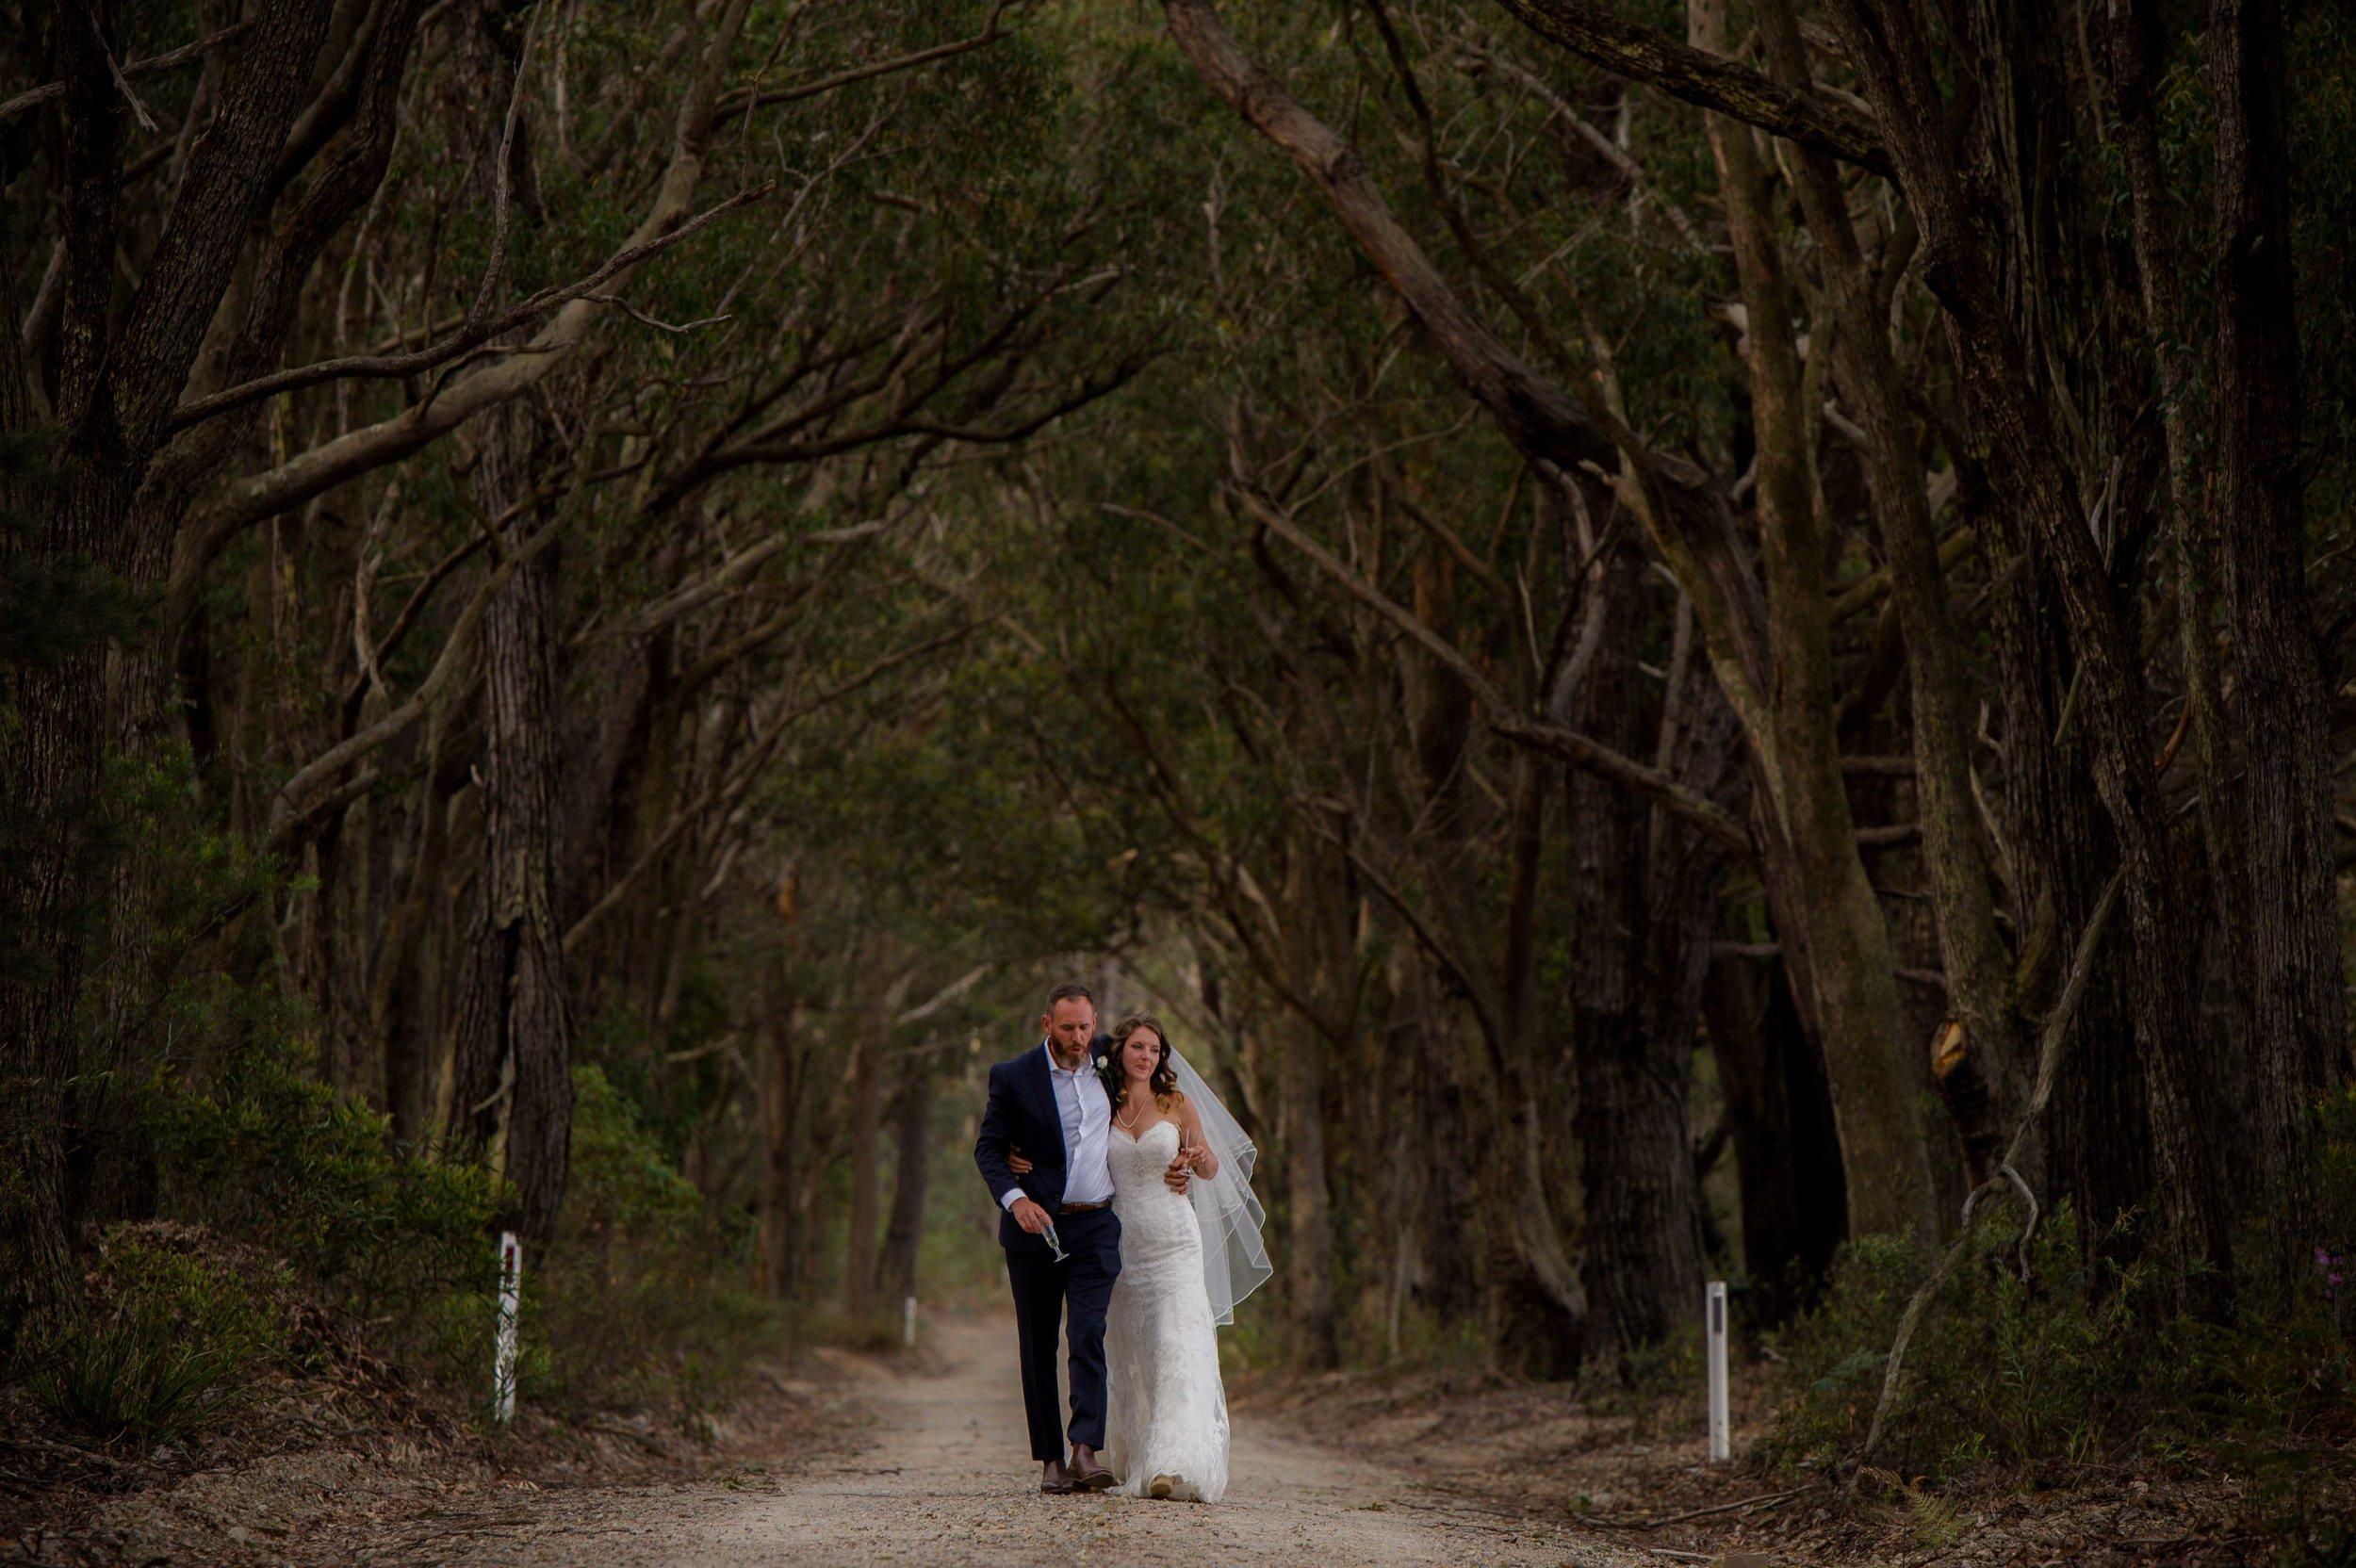 Patrick and Vivki | Talong, NSW